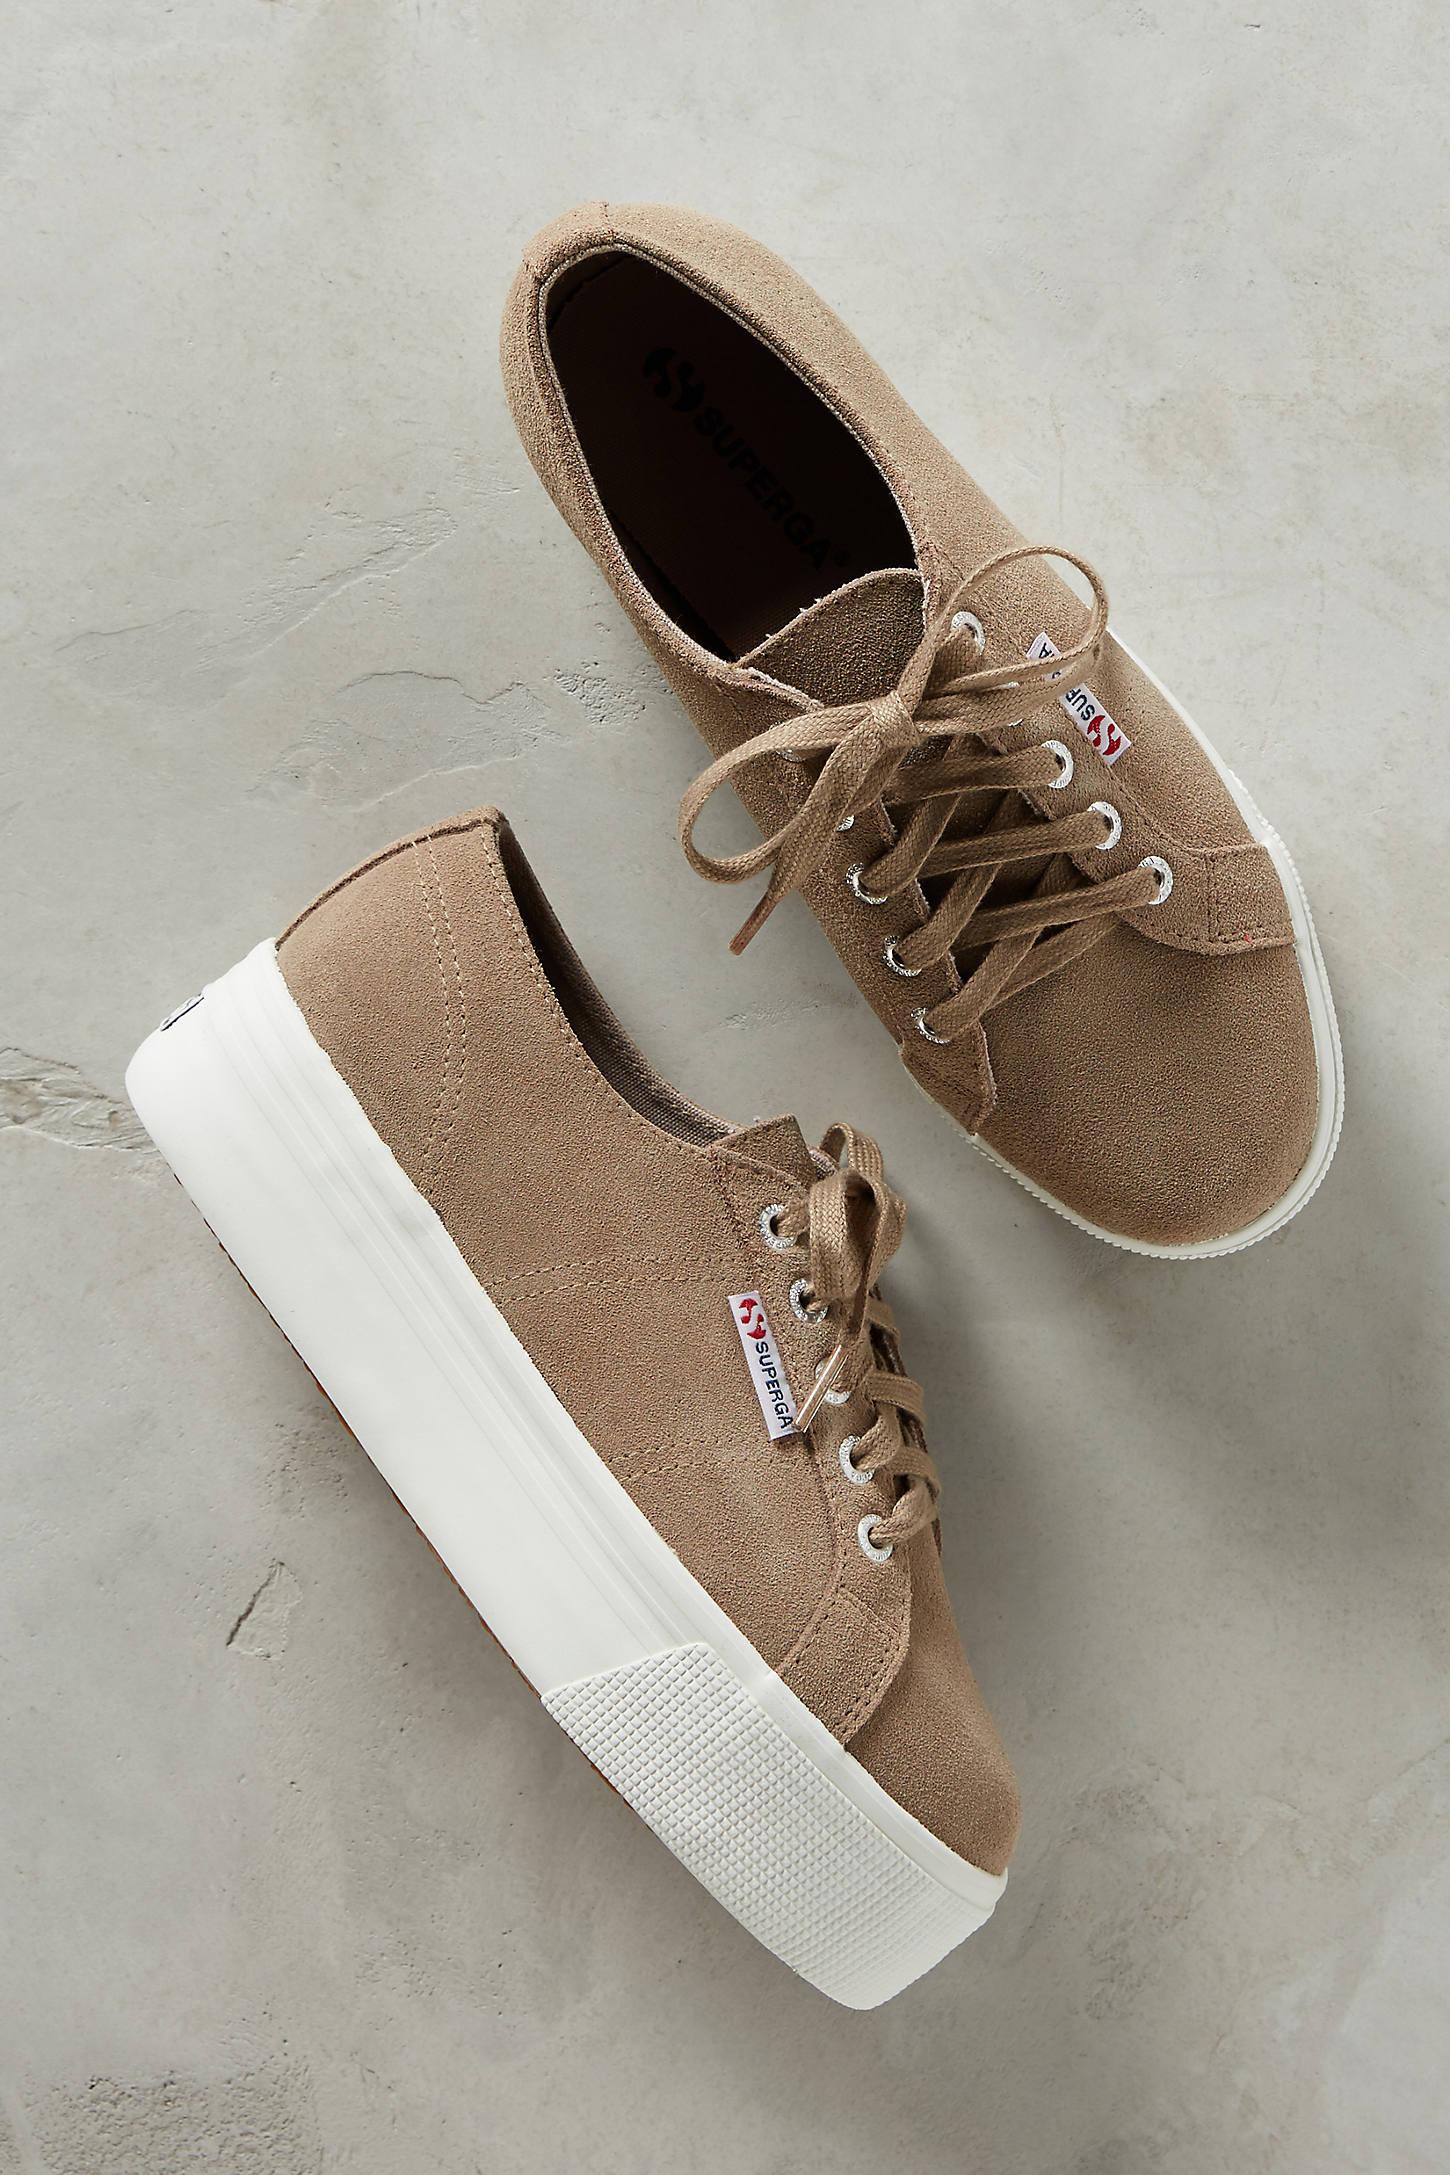 Superga Suede Platform Sneakers